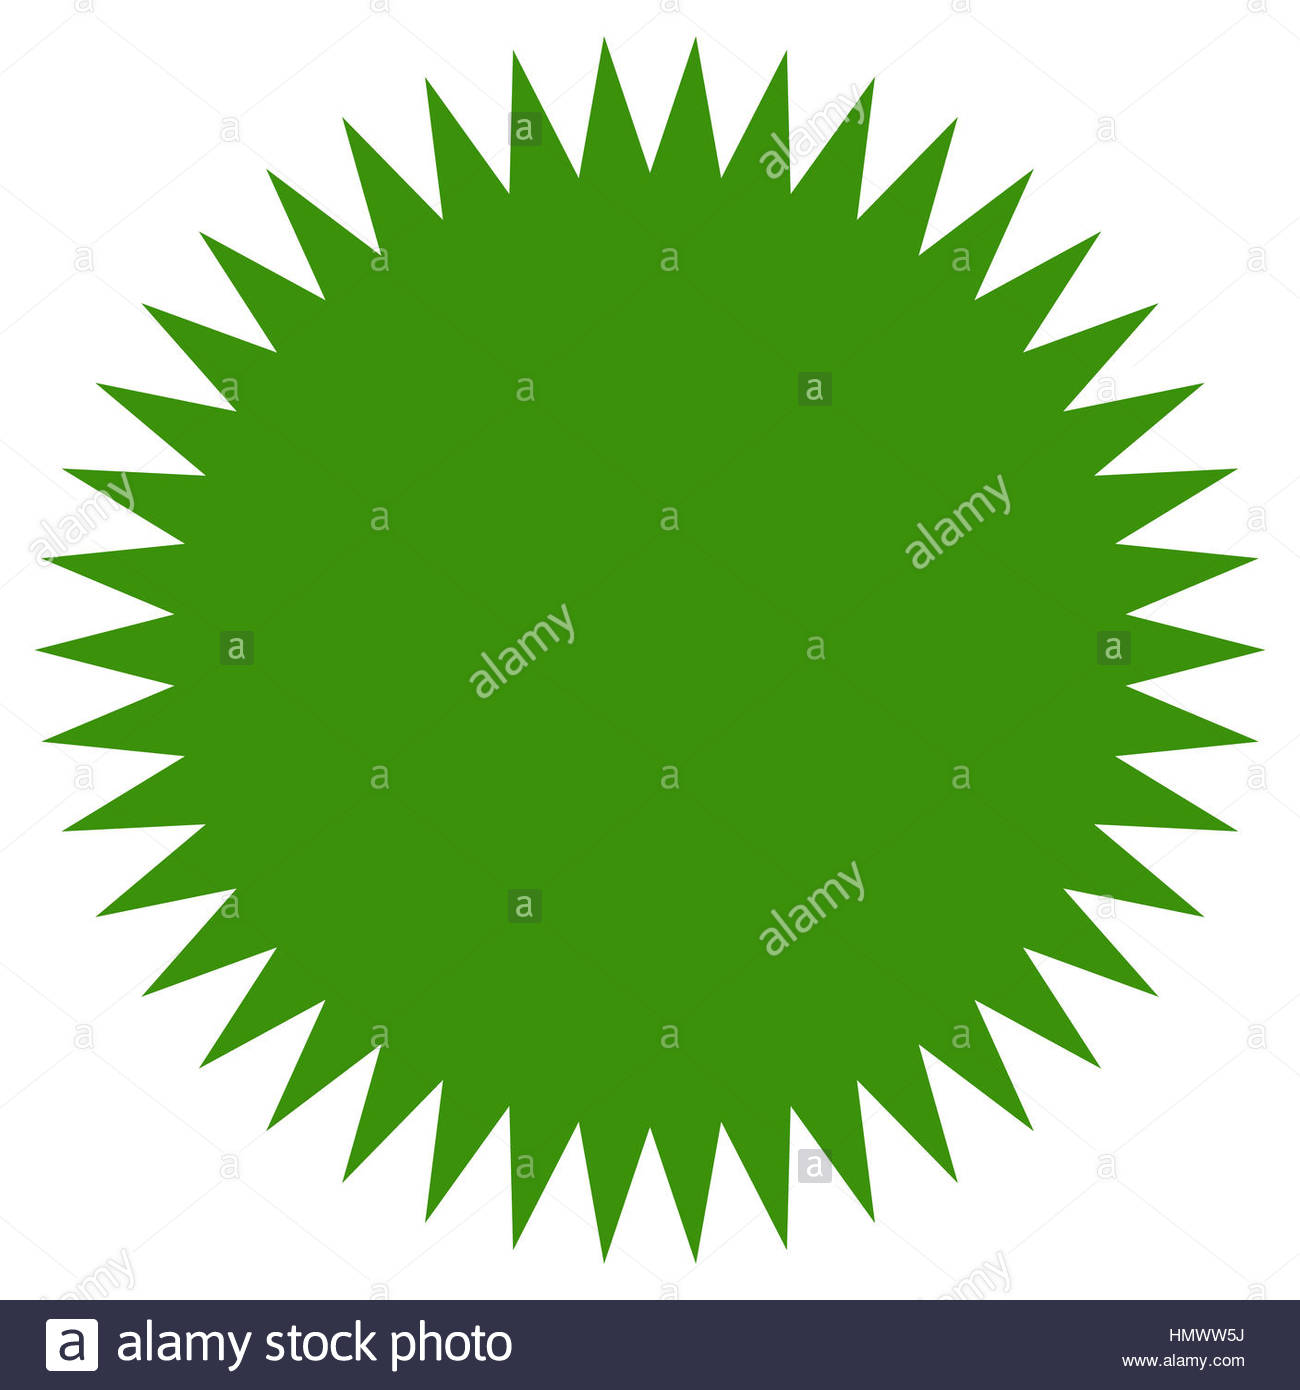 1300x1390 Starburst, Sunburst Shape. Flat Price Tag, Price Flash Icon Stock